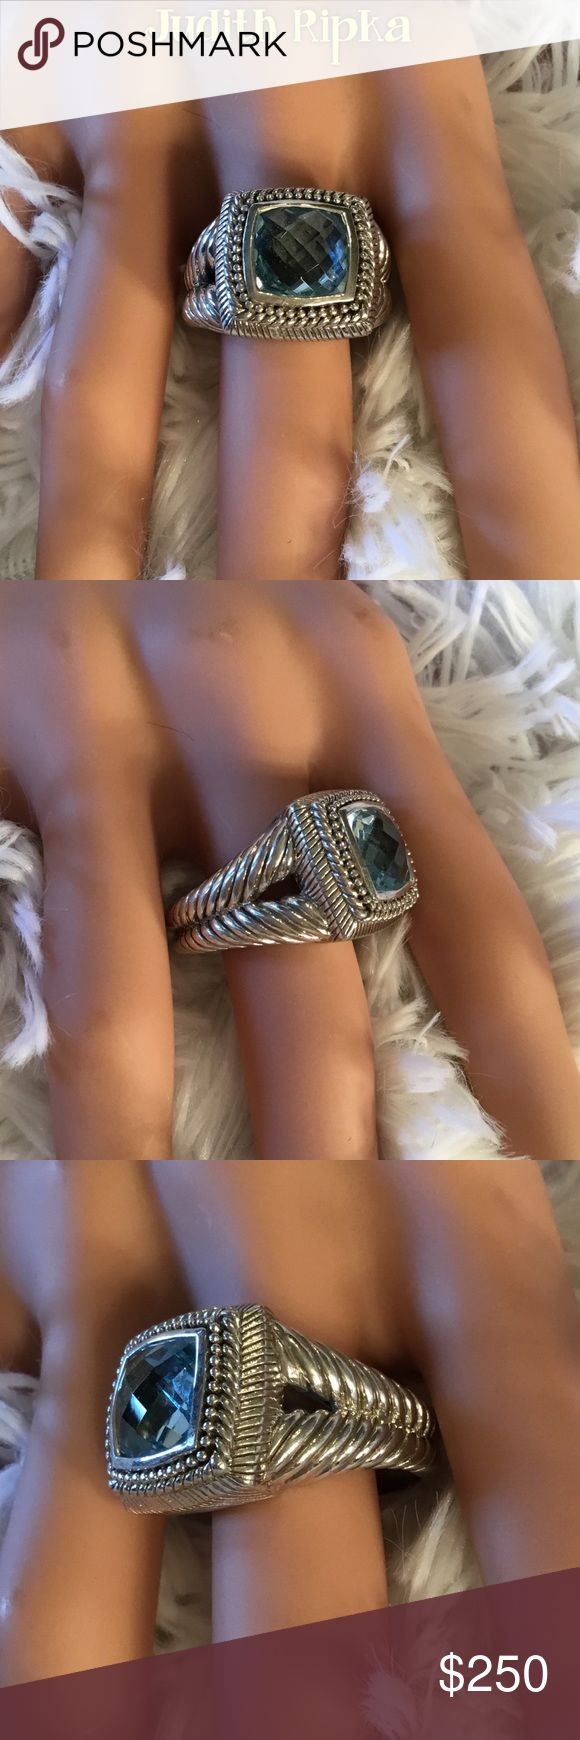 Blue Topaz Beautiful ring by Judith Ripka, blue topaz, cushion cut, with checker board cut...size 10... Judith Ripka Jewelry Rings